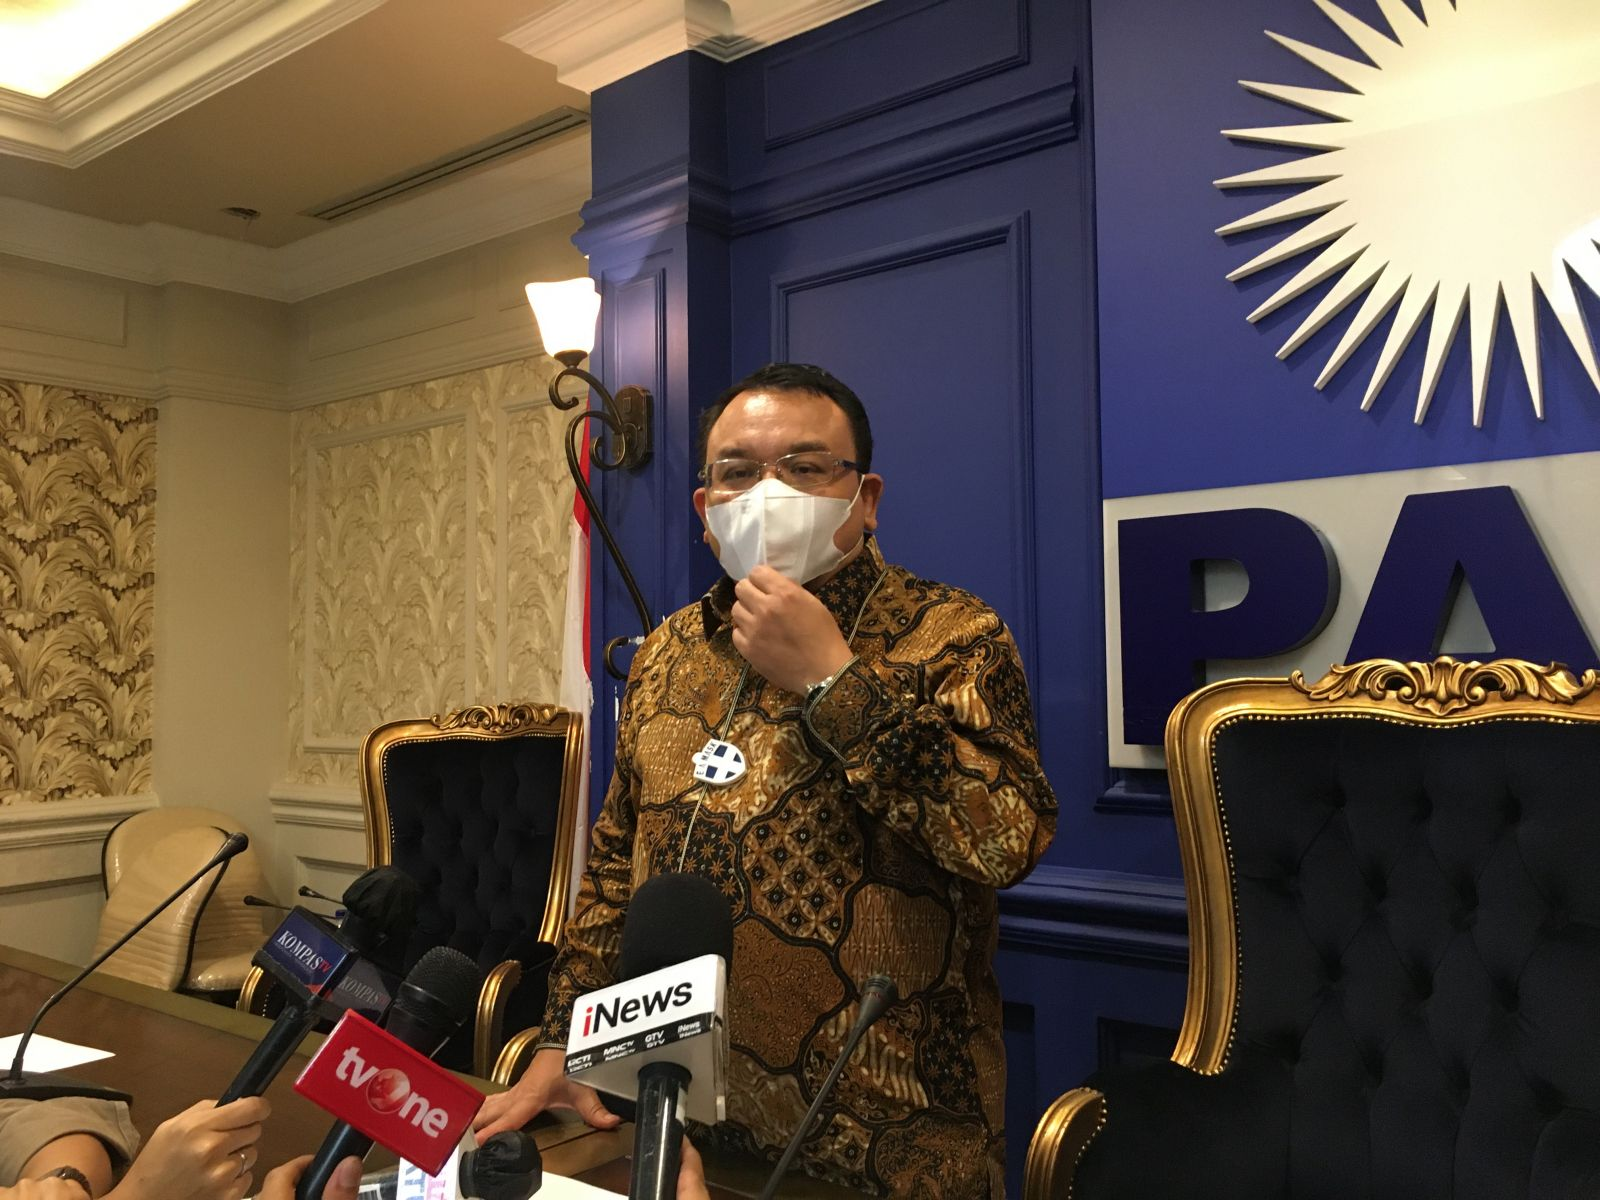 Saleh Dulay Komentari Politisi Gerindra yang Kritik Anies Baswedan. Foto : Mia Kamila/GenPI.co